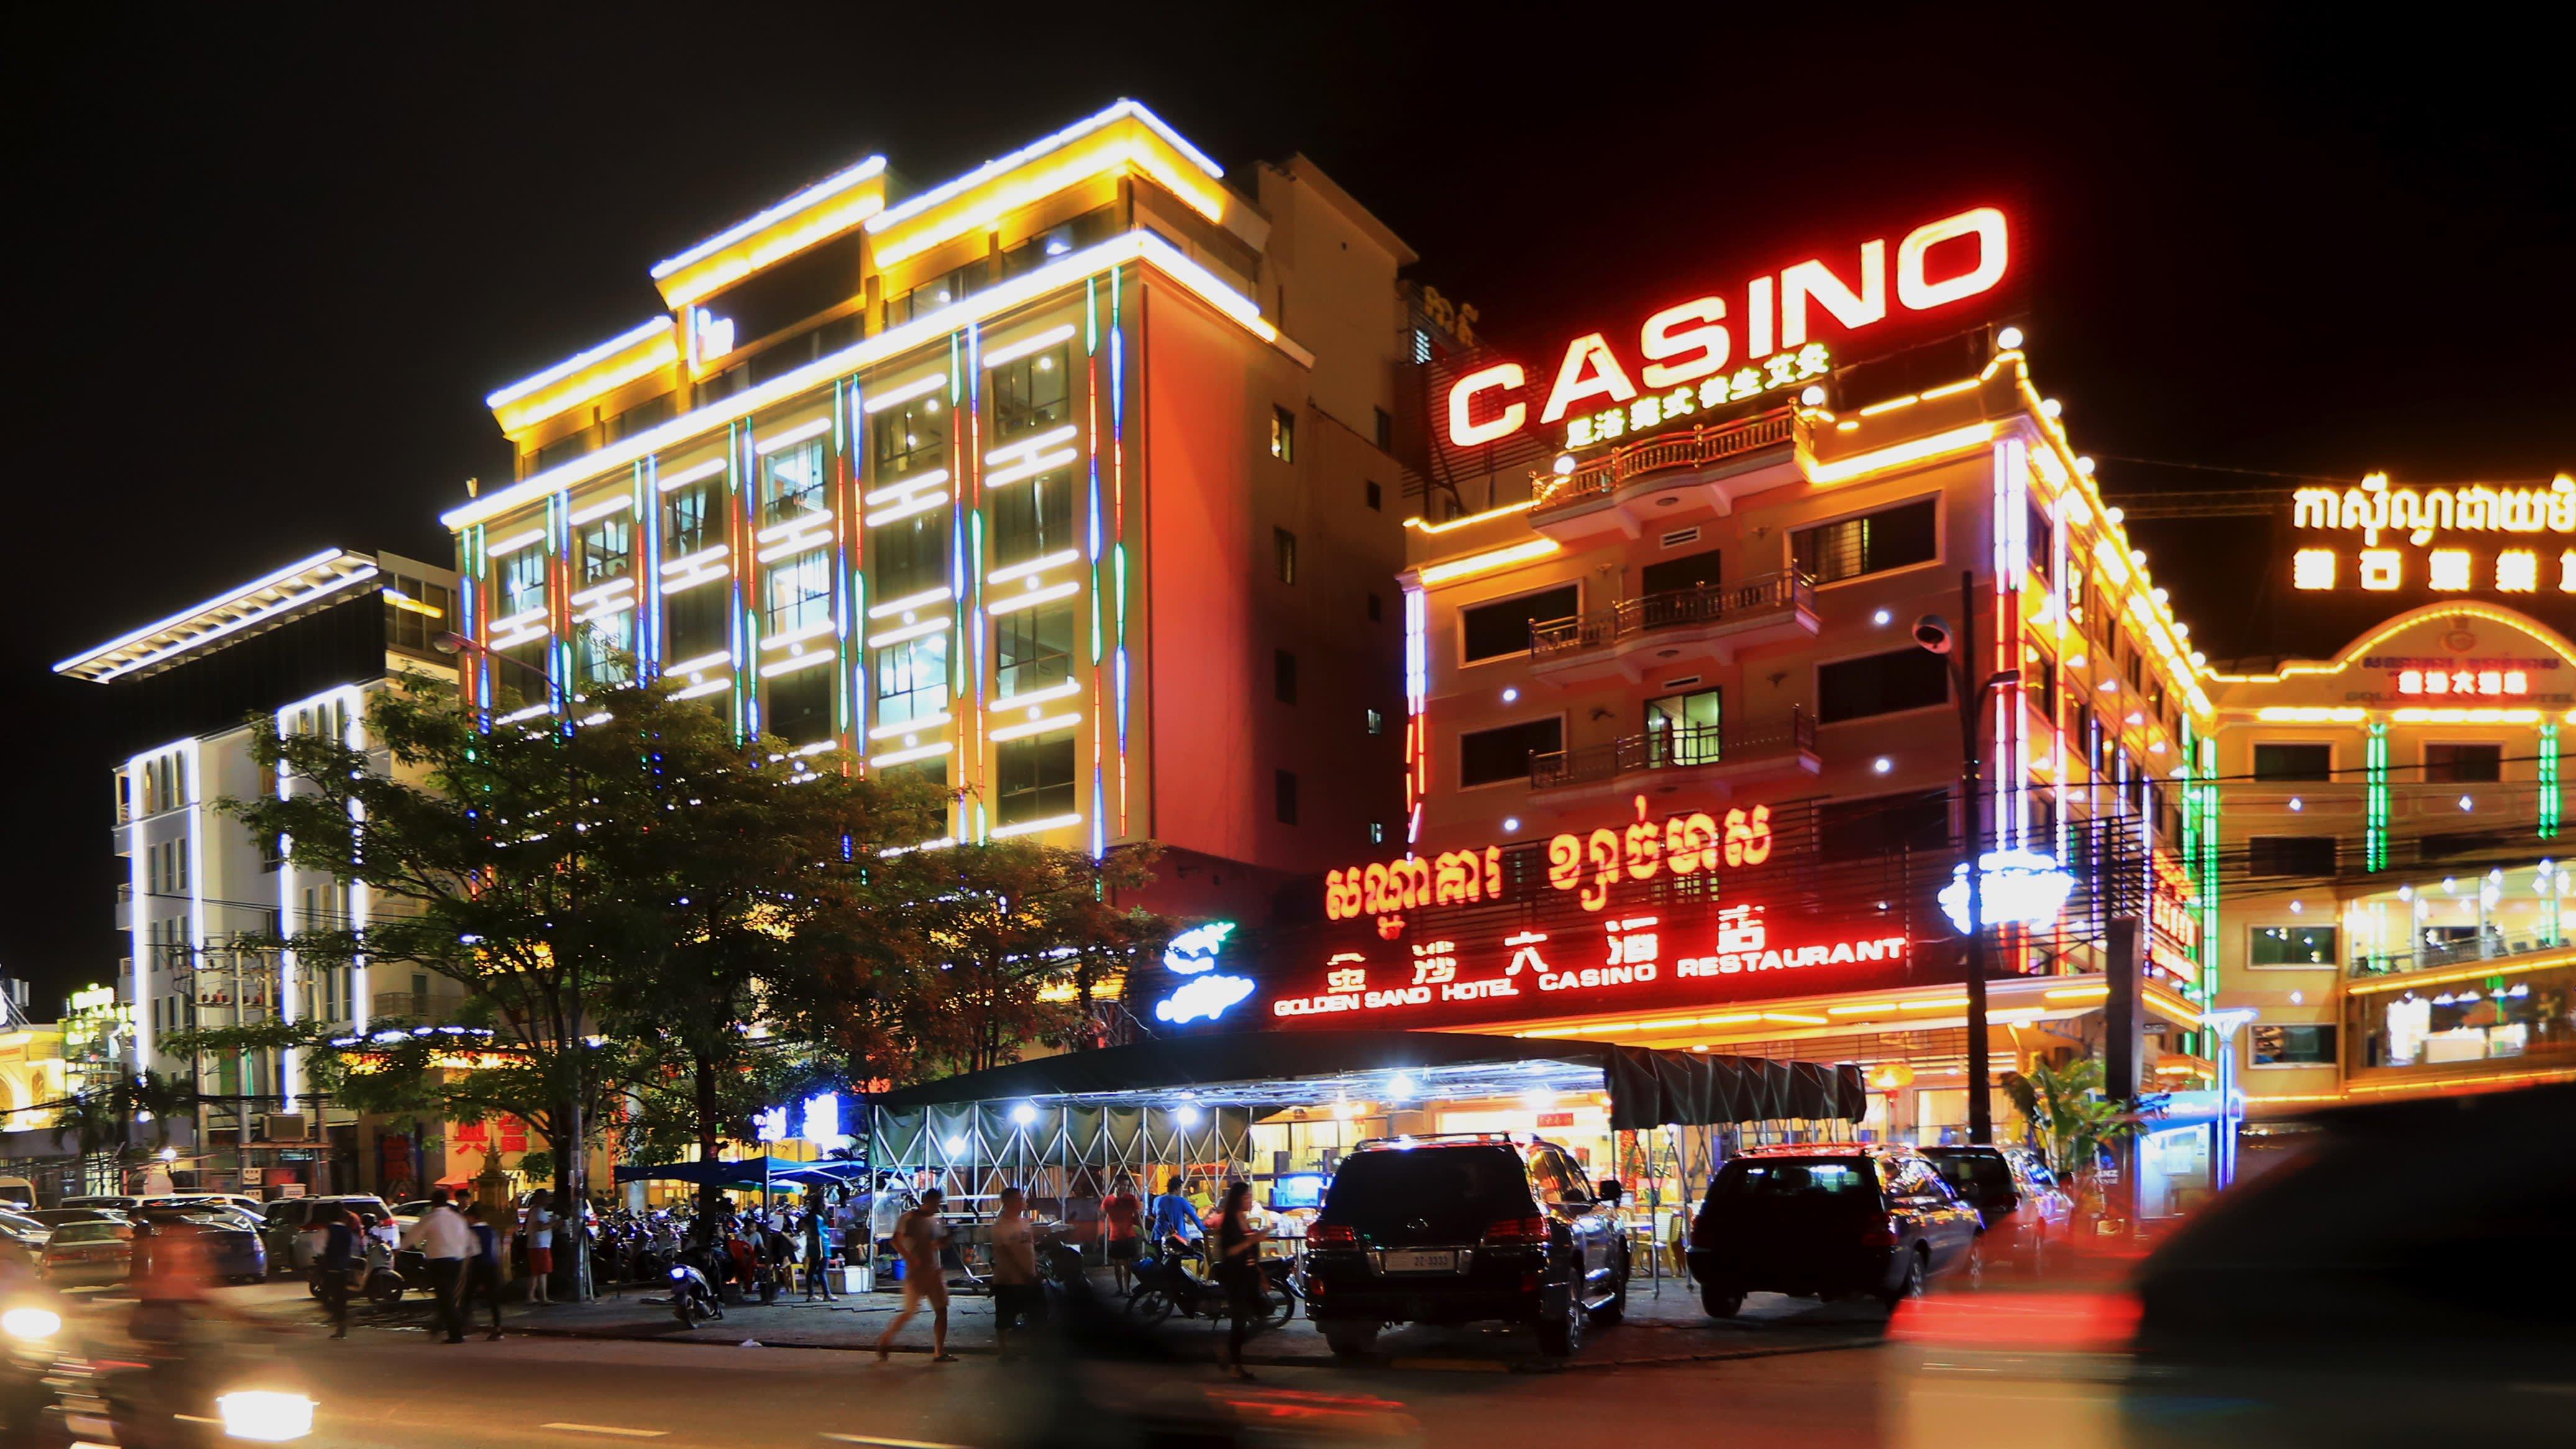 Casinos Close As Cambodia Bans Online Gambling